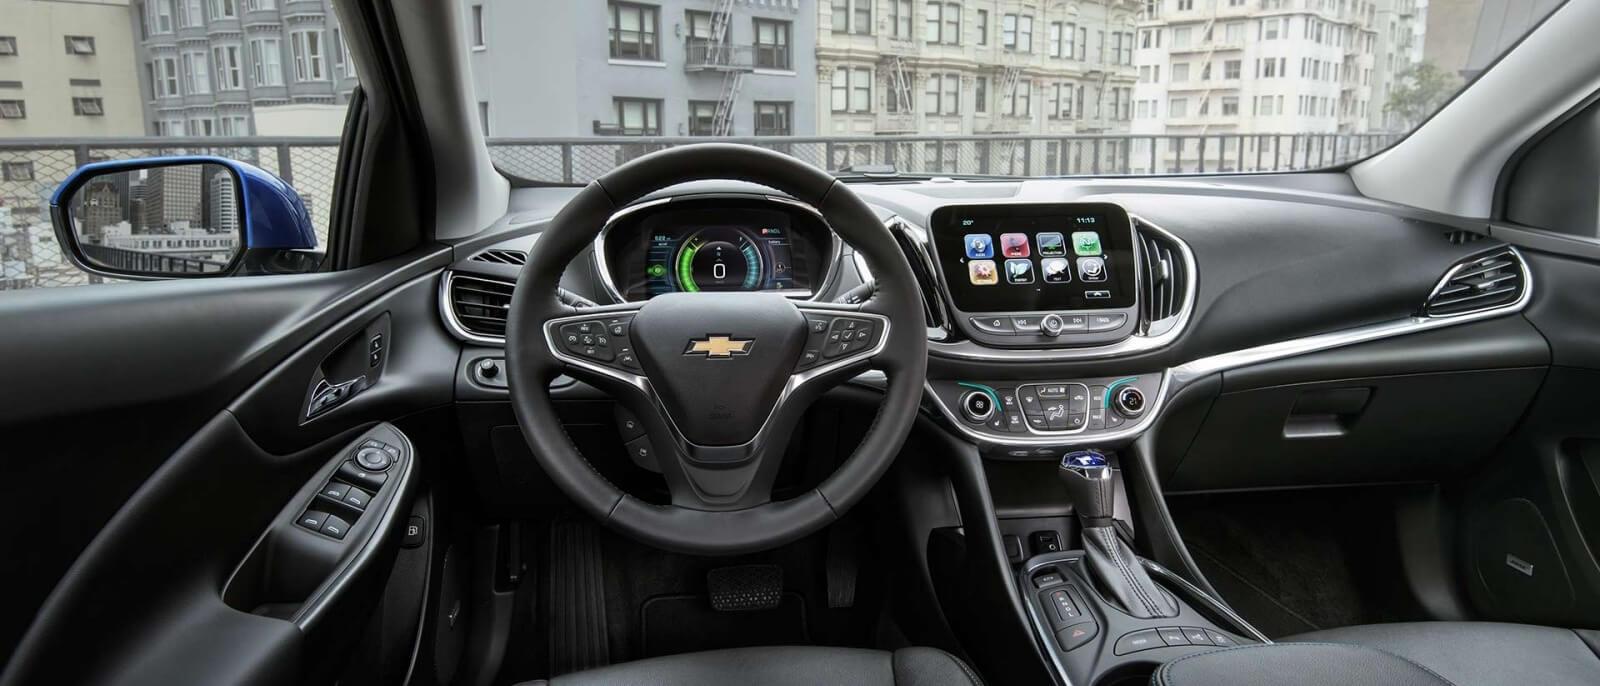 2017 Chevrolet Volt front interior